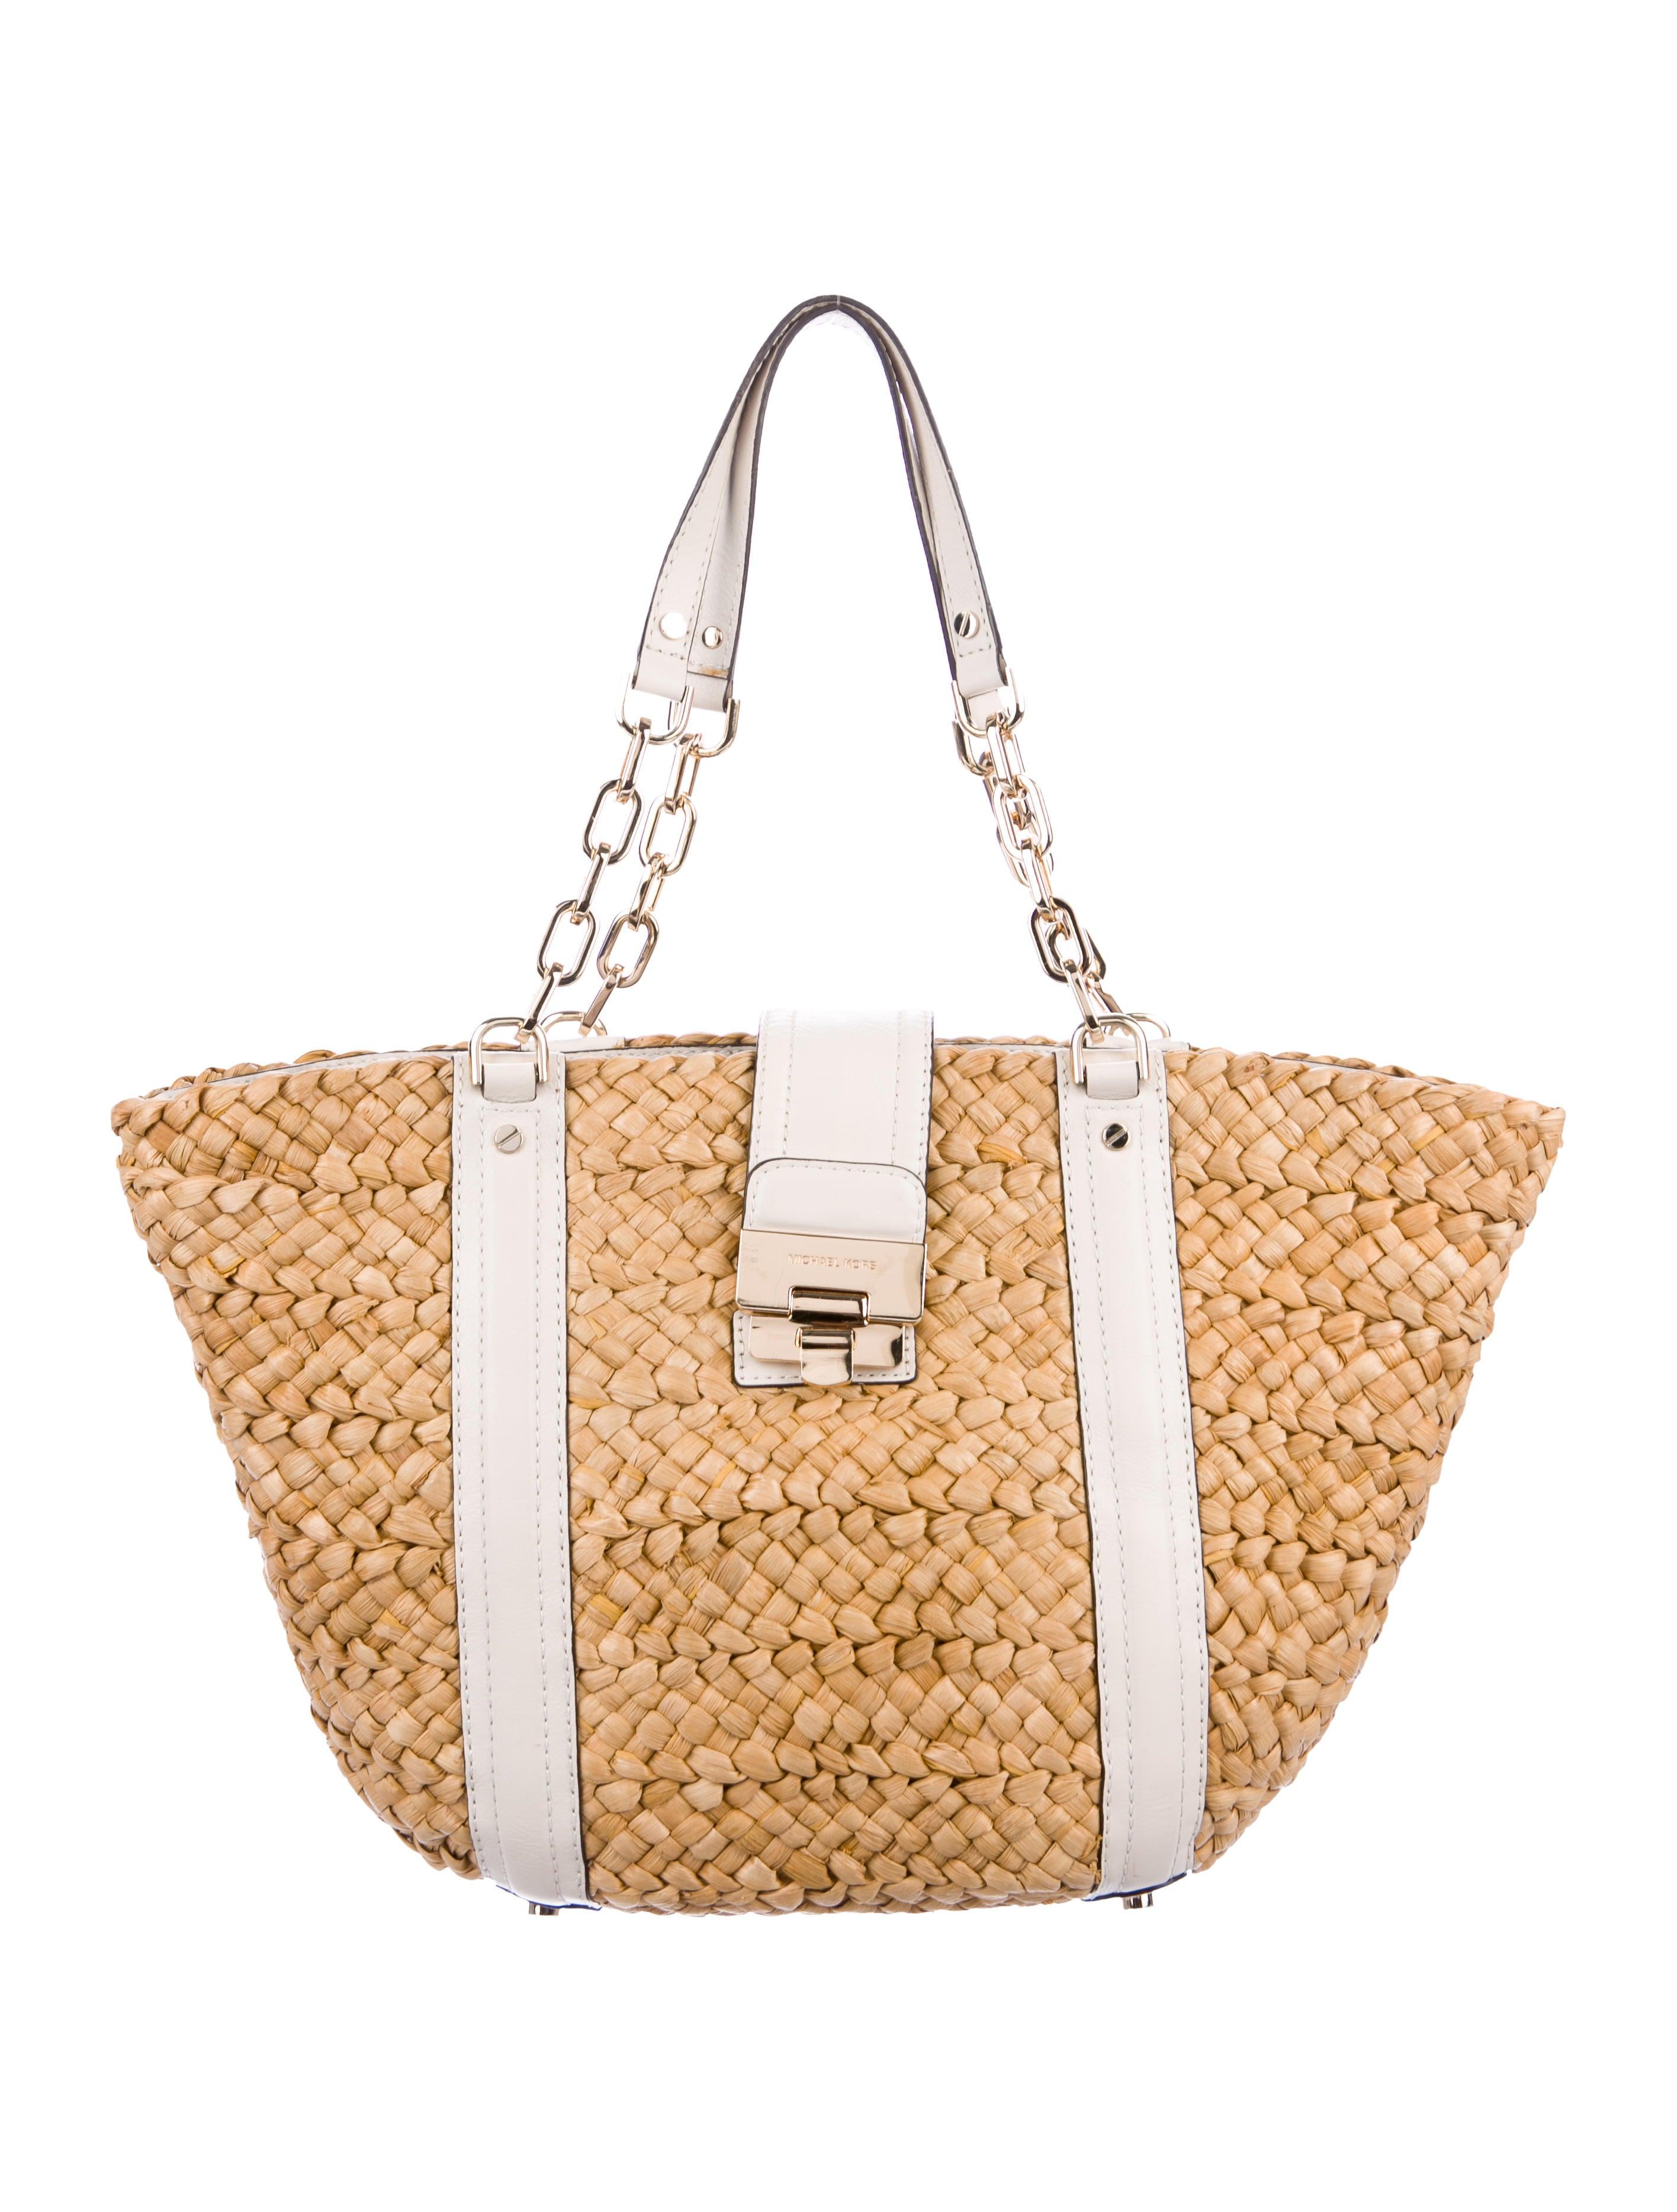 66d1946e4801 Michael Michael Kors Leather-Trimmed Raffia Tote - Handbags - WM529402